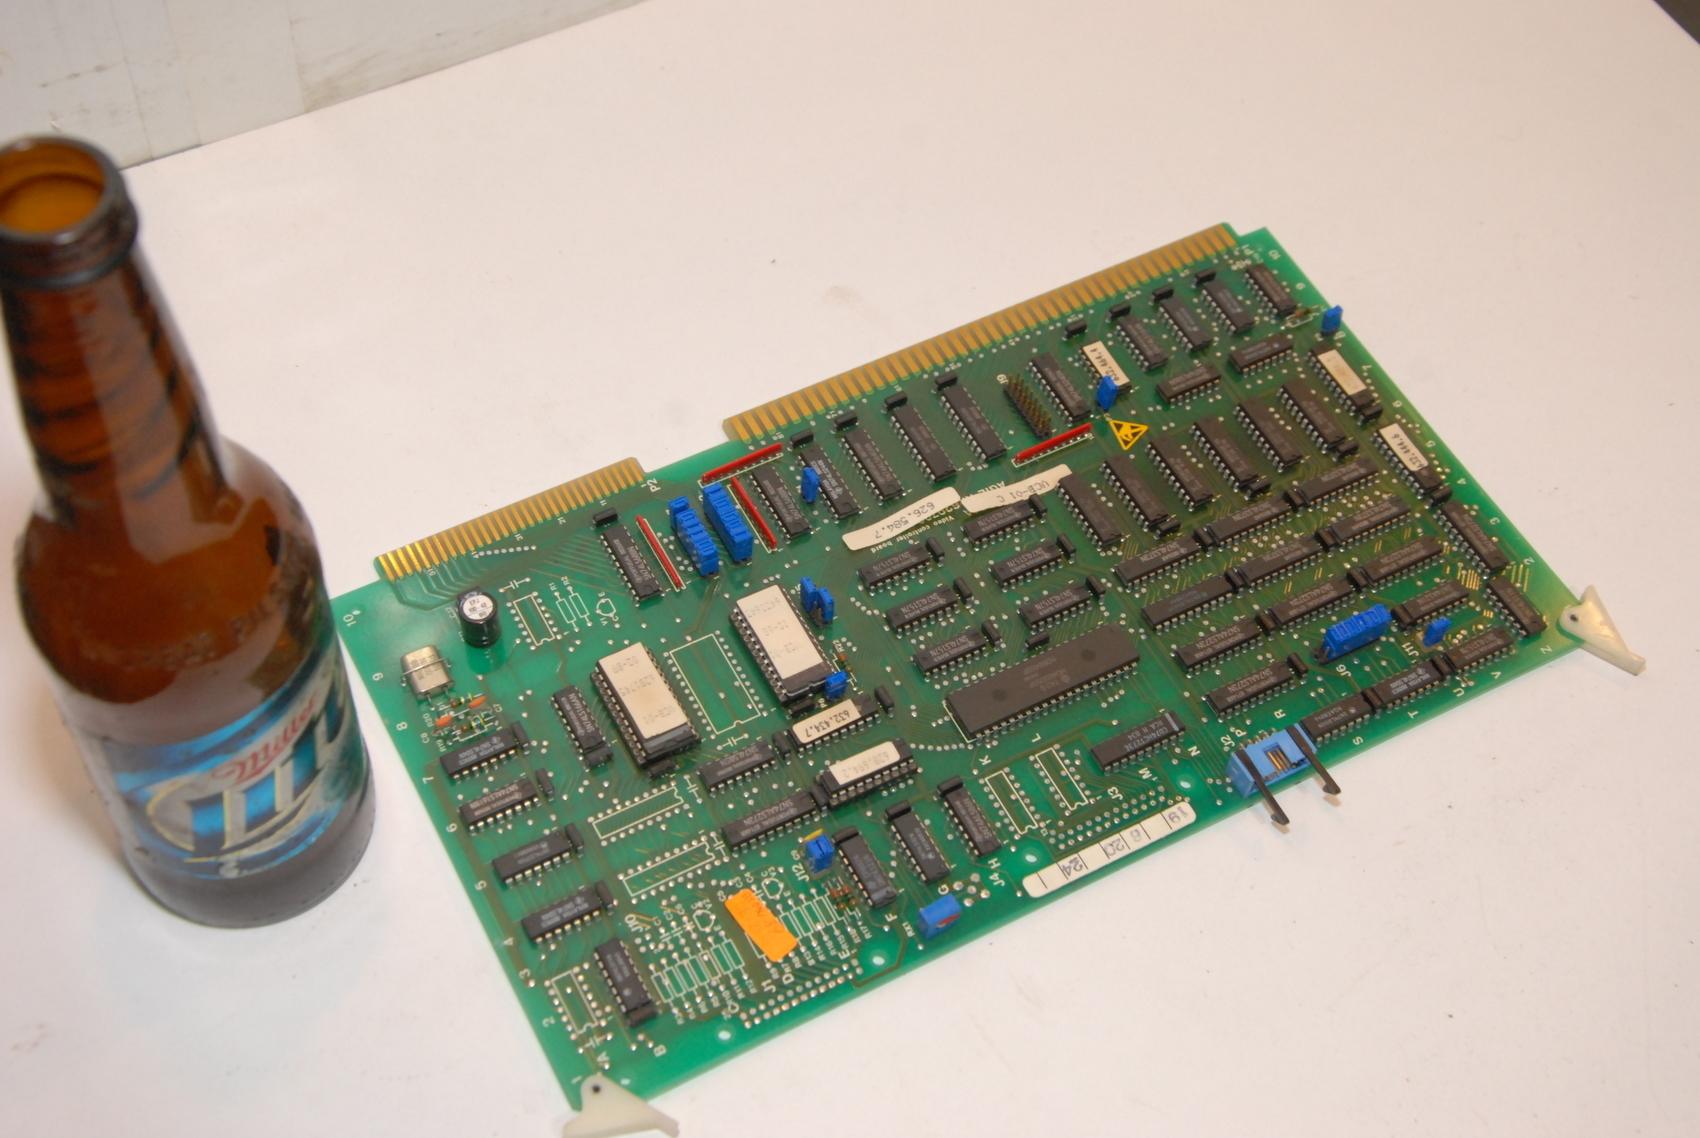 AGIE AgieCut EDM VCB-01A,VCB01A 629793.1 CIRCUIT BOARD